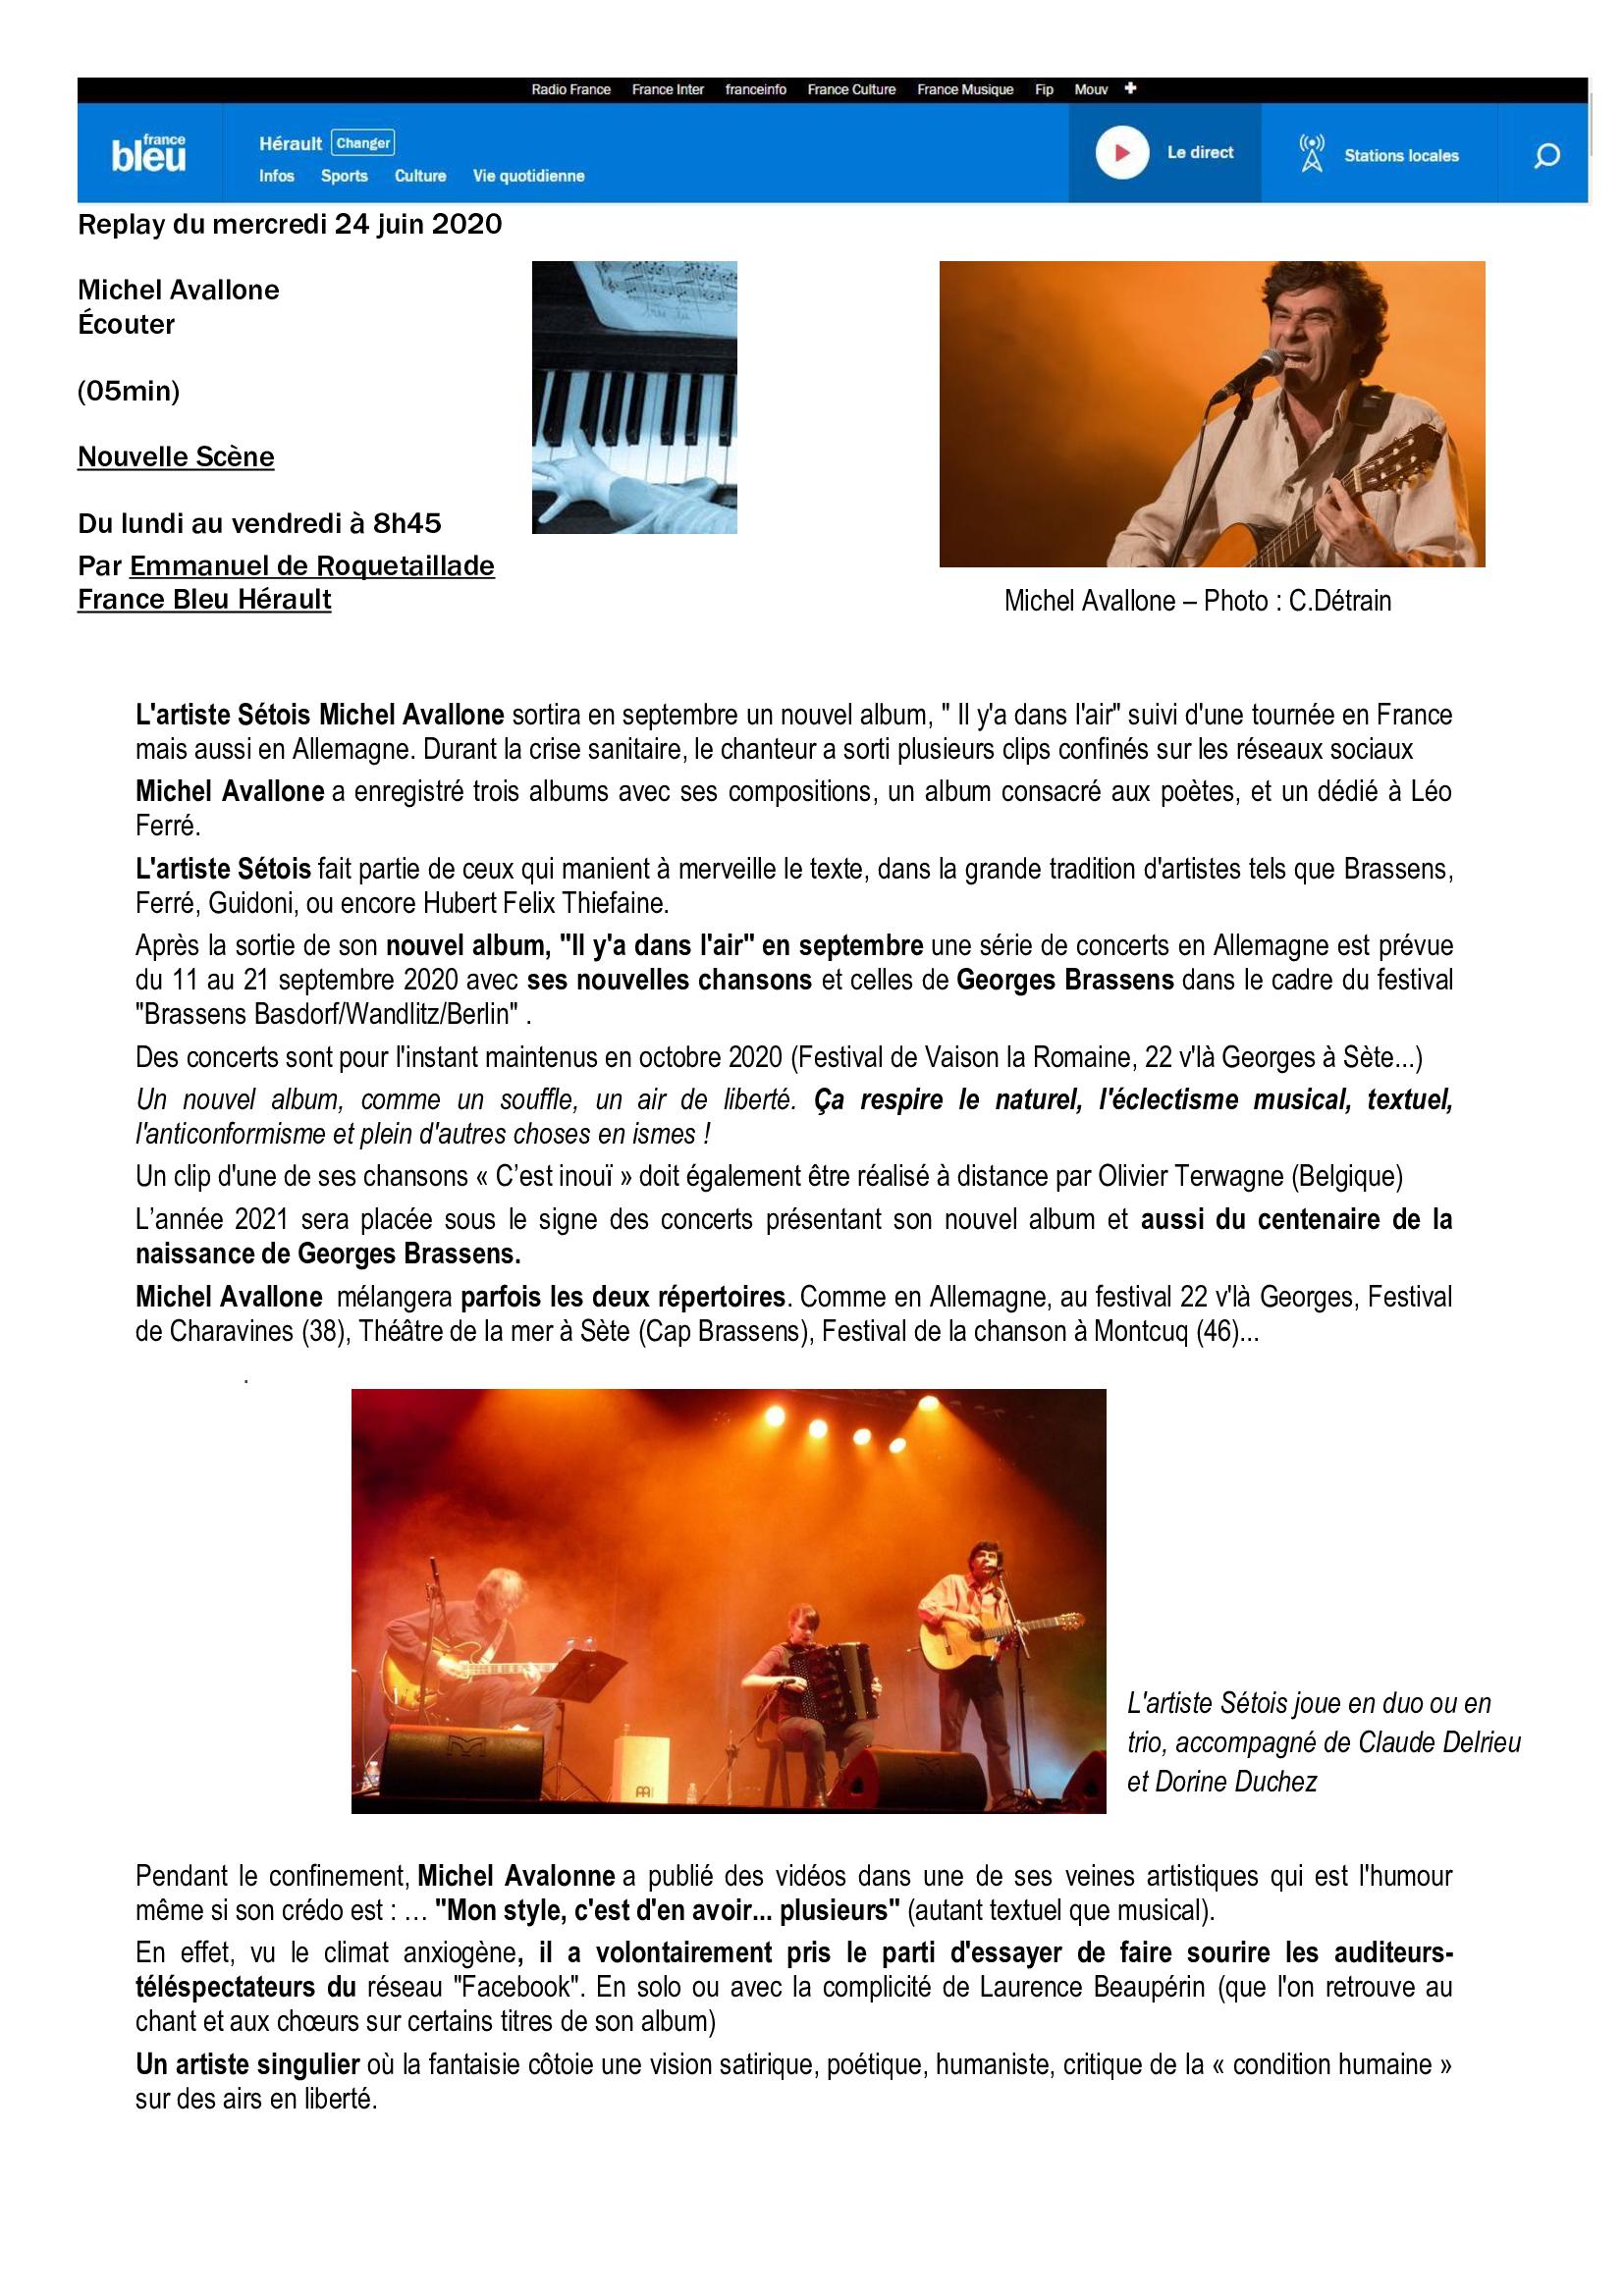 Dossier-de-presse-chronique-Radio-France